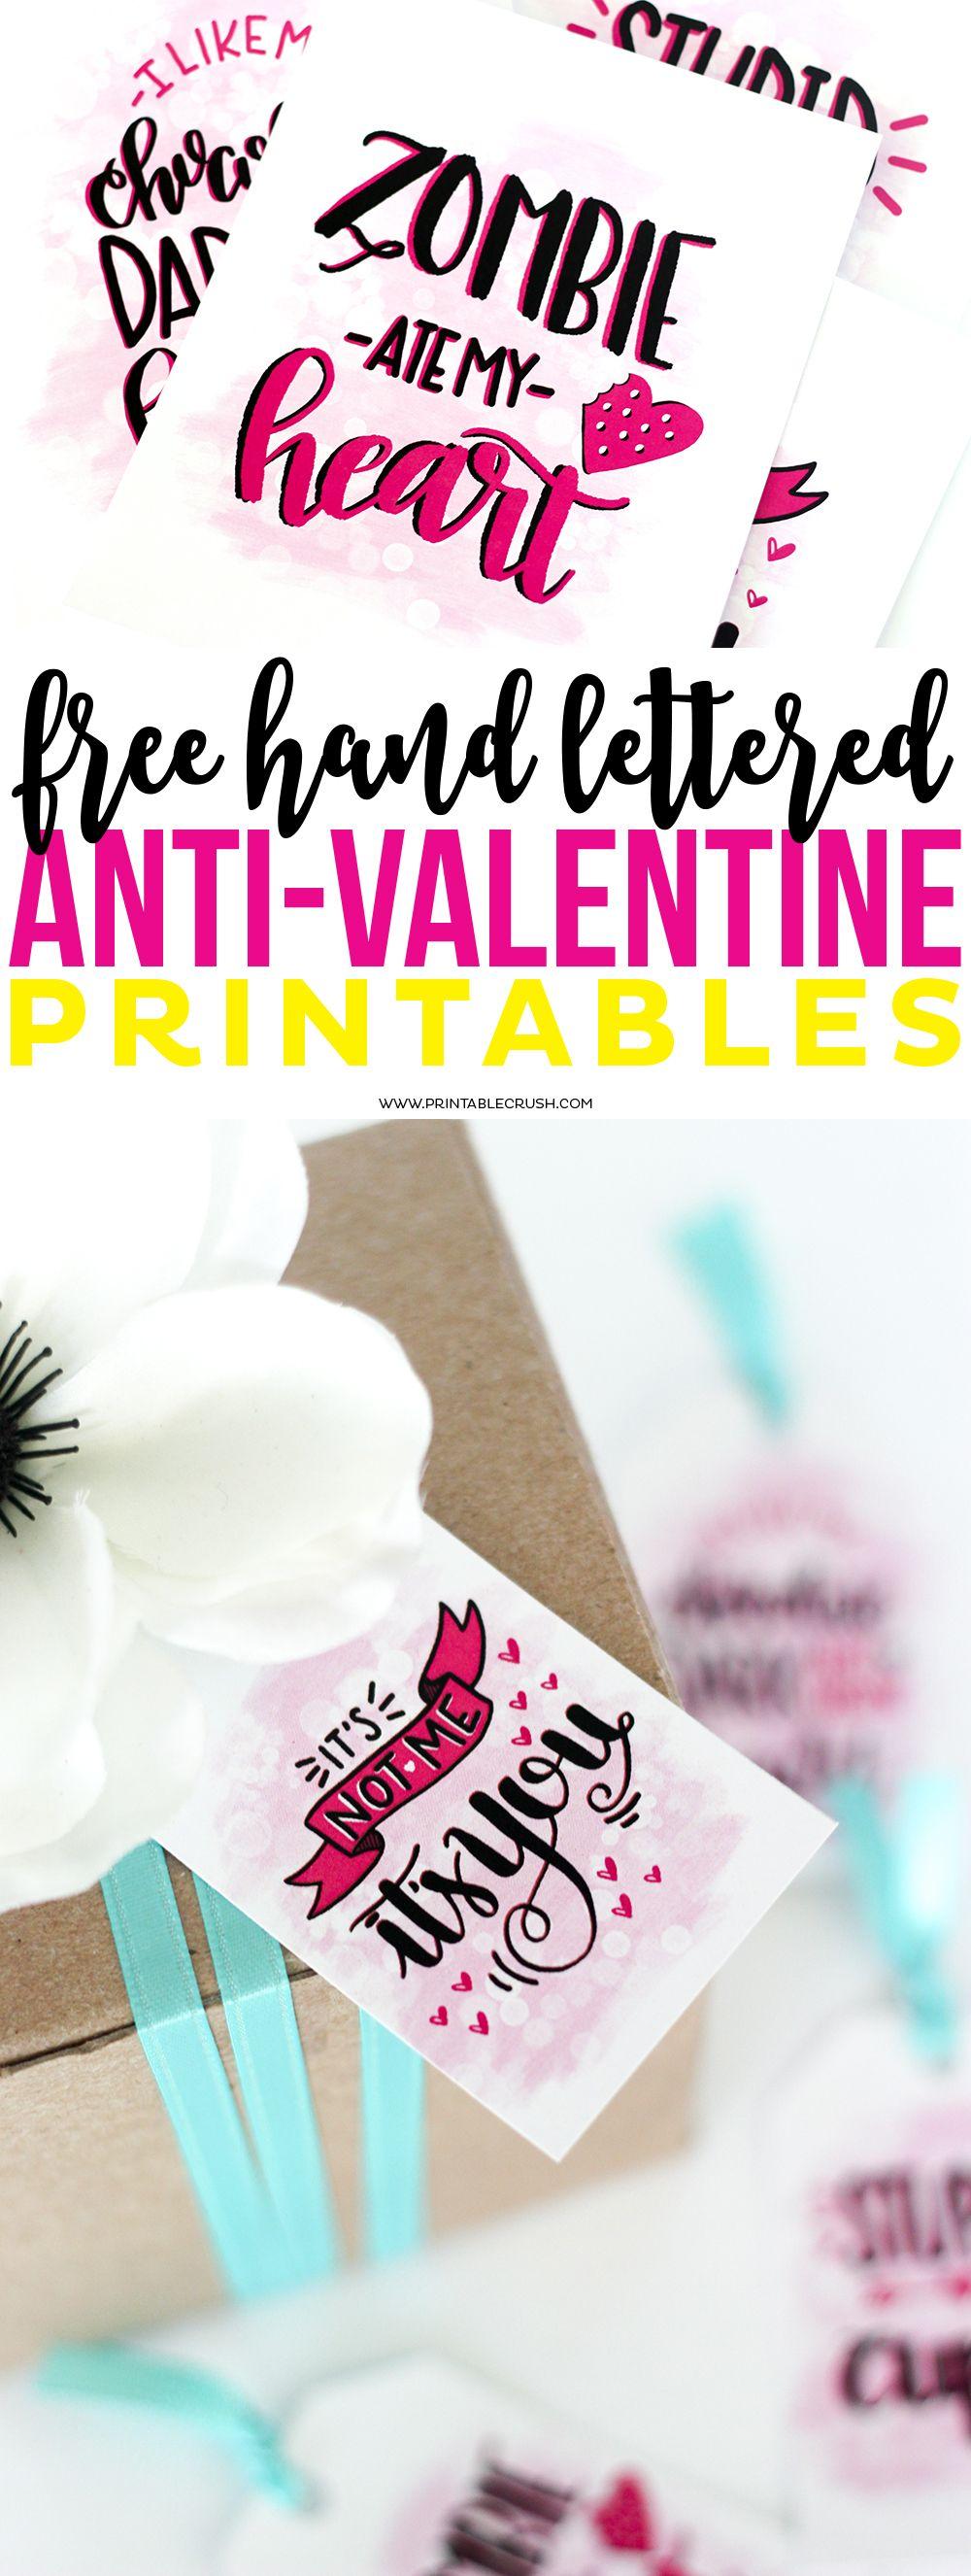 FREE Hand Lettered AntiValentine Printables Anti